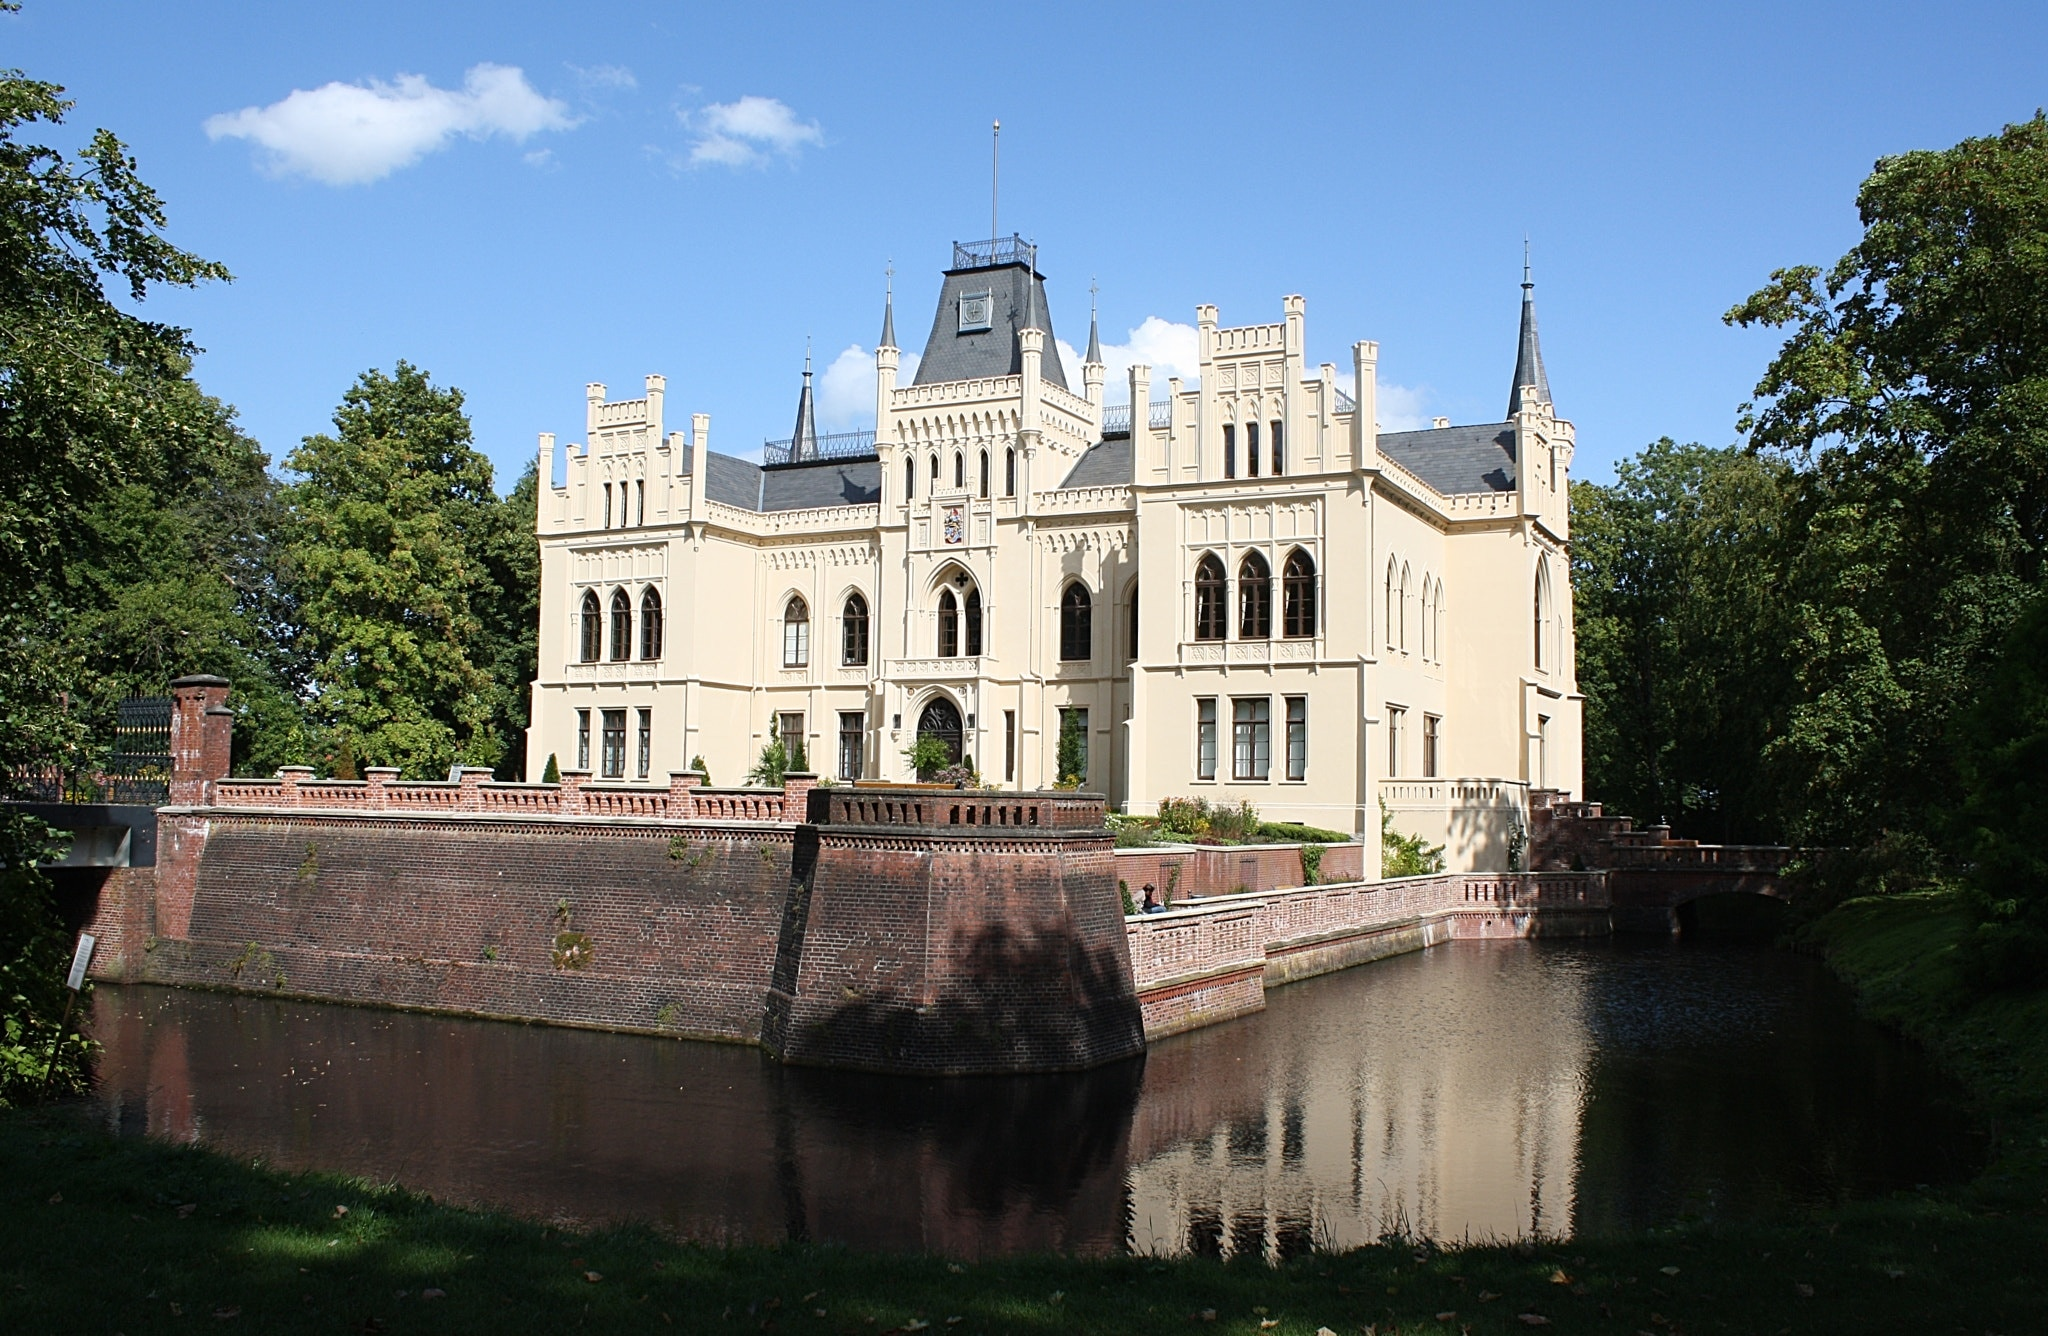 Leer District, Lower Saxony, Germany